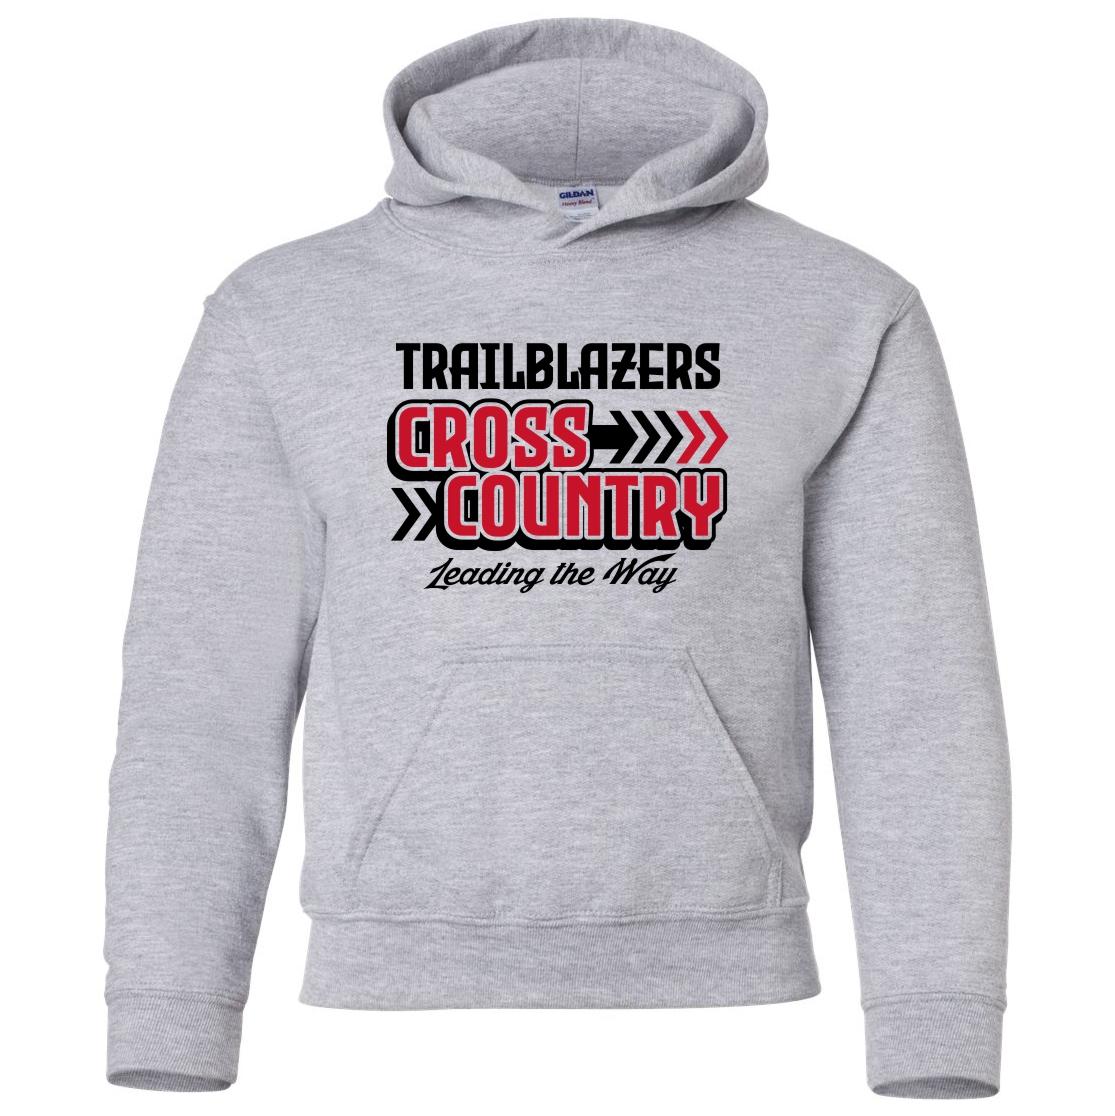 Trailblazers-youth-hoodie